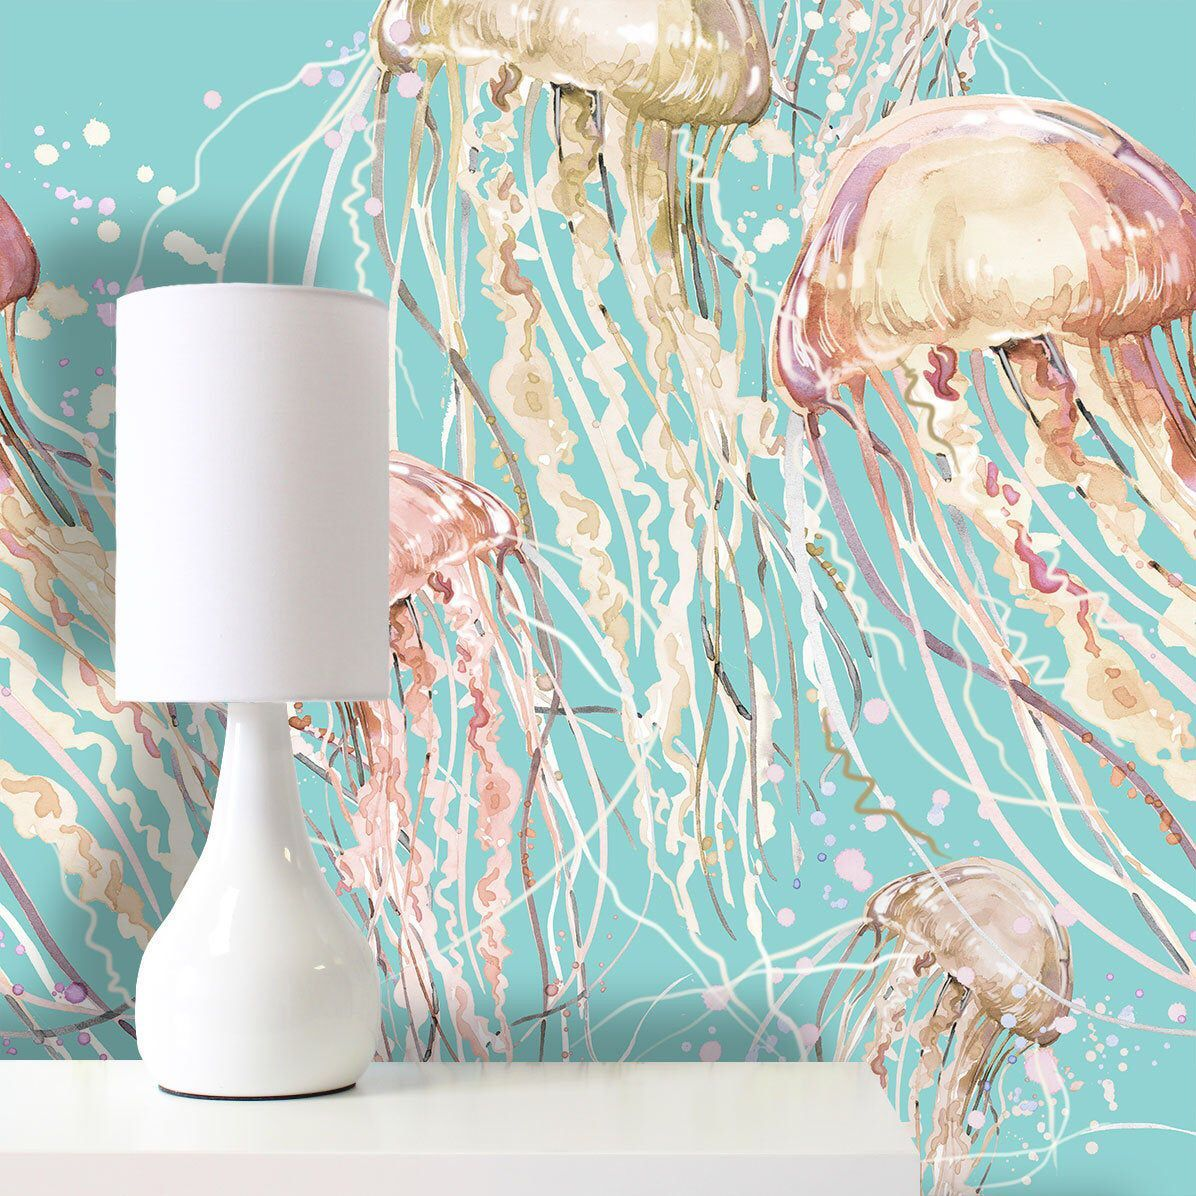 Jellyfish Wallpaper Removable Wallpaper Self Adhesive Wallpaper Pasted Wallpaper Mural Temporar Removable Wallpaper Self Adhesive Wallpaper Bold Wallpaper